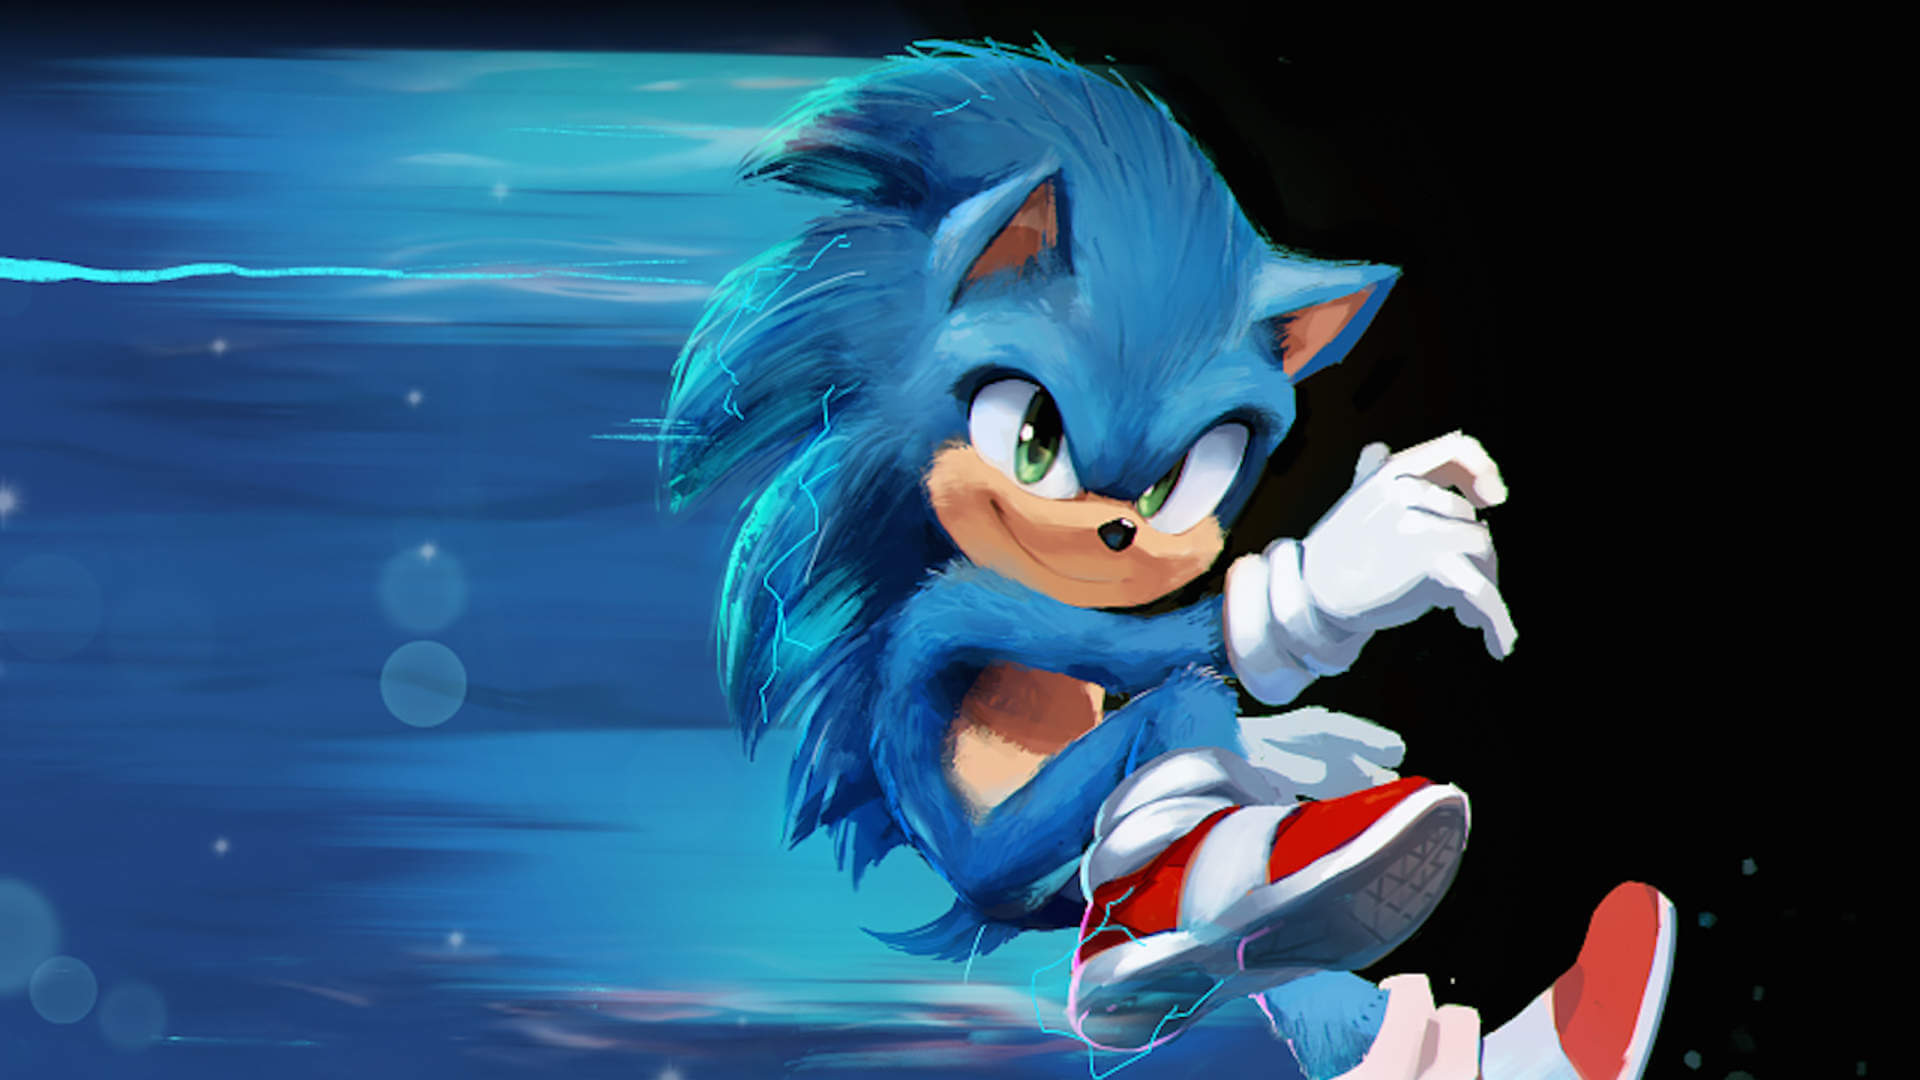 Historia y origen de Sonic